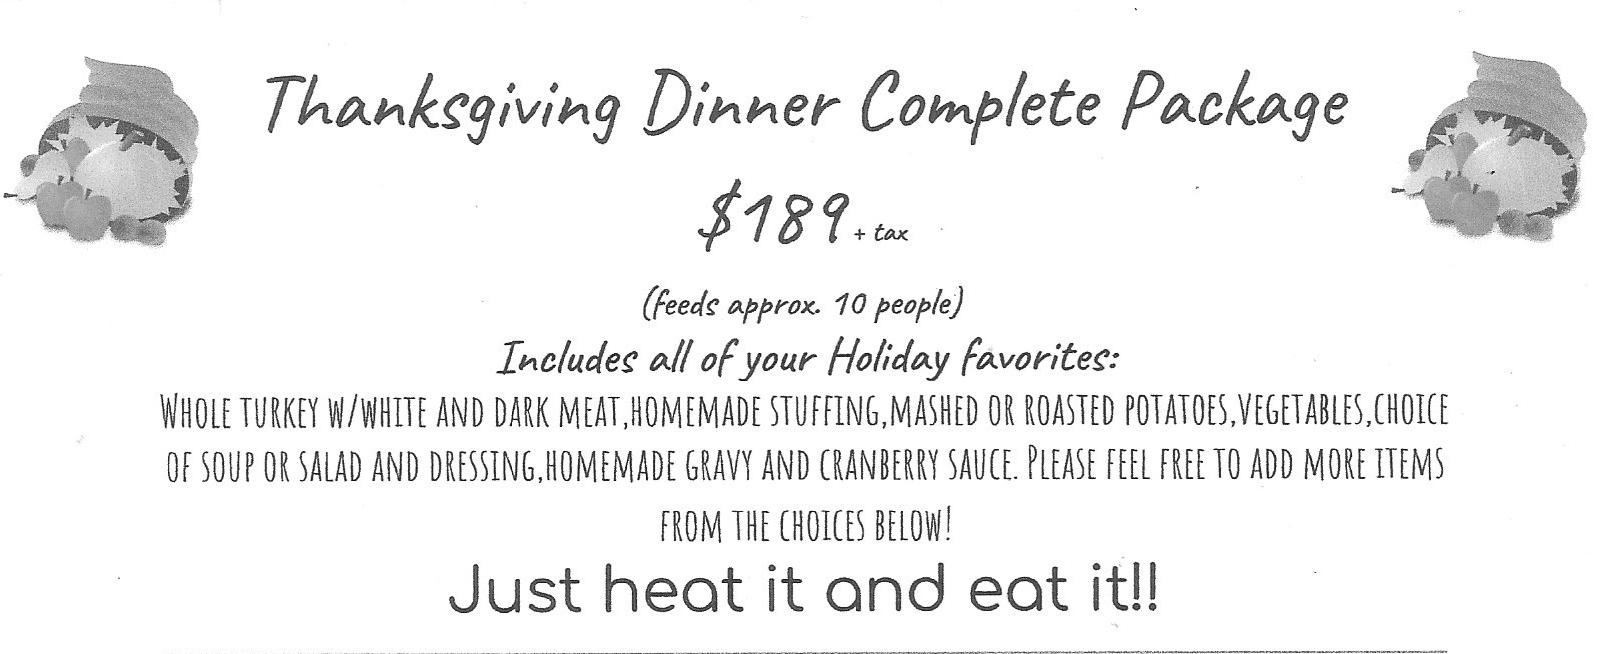 Thanksgiving Dinner package image